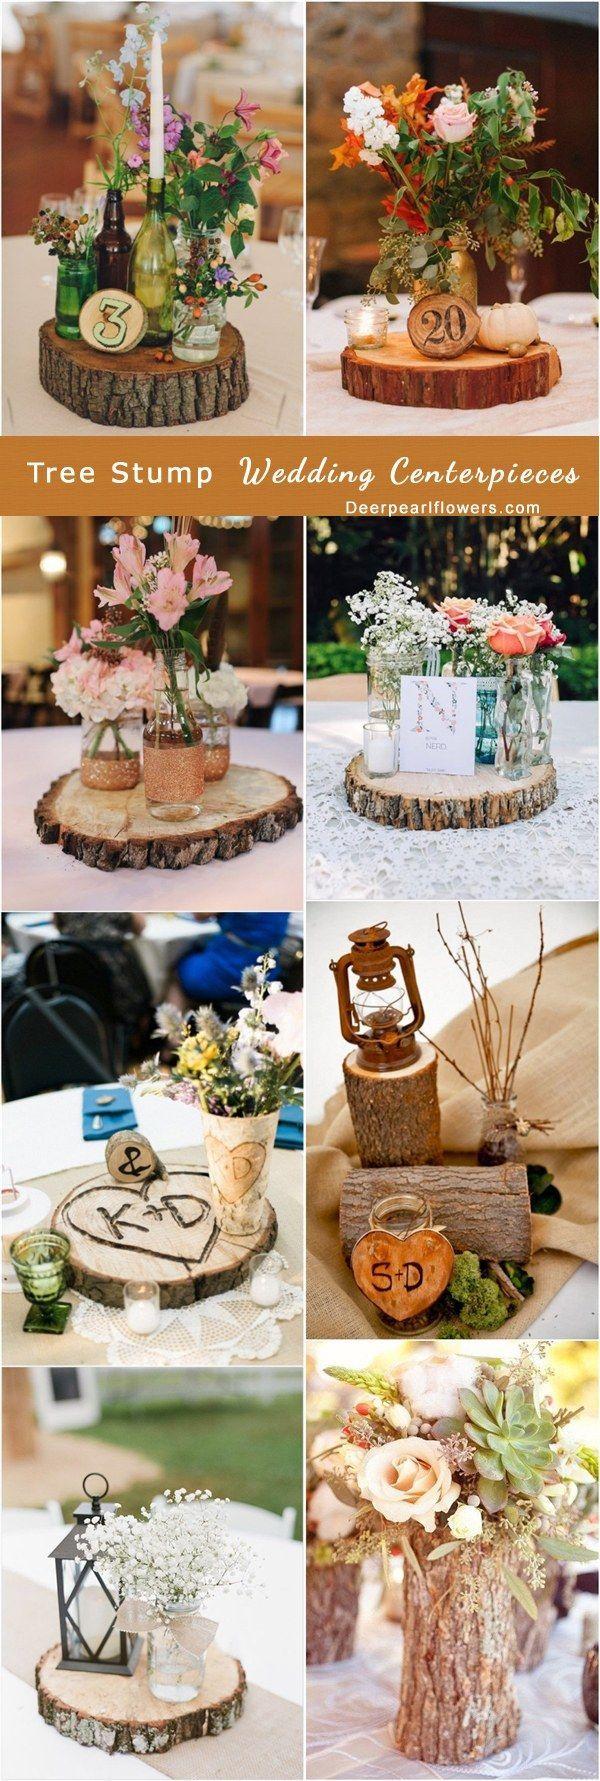 Rustic Tree Stump Wedding Centerpieces Httpdeerpearlflowers